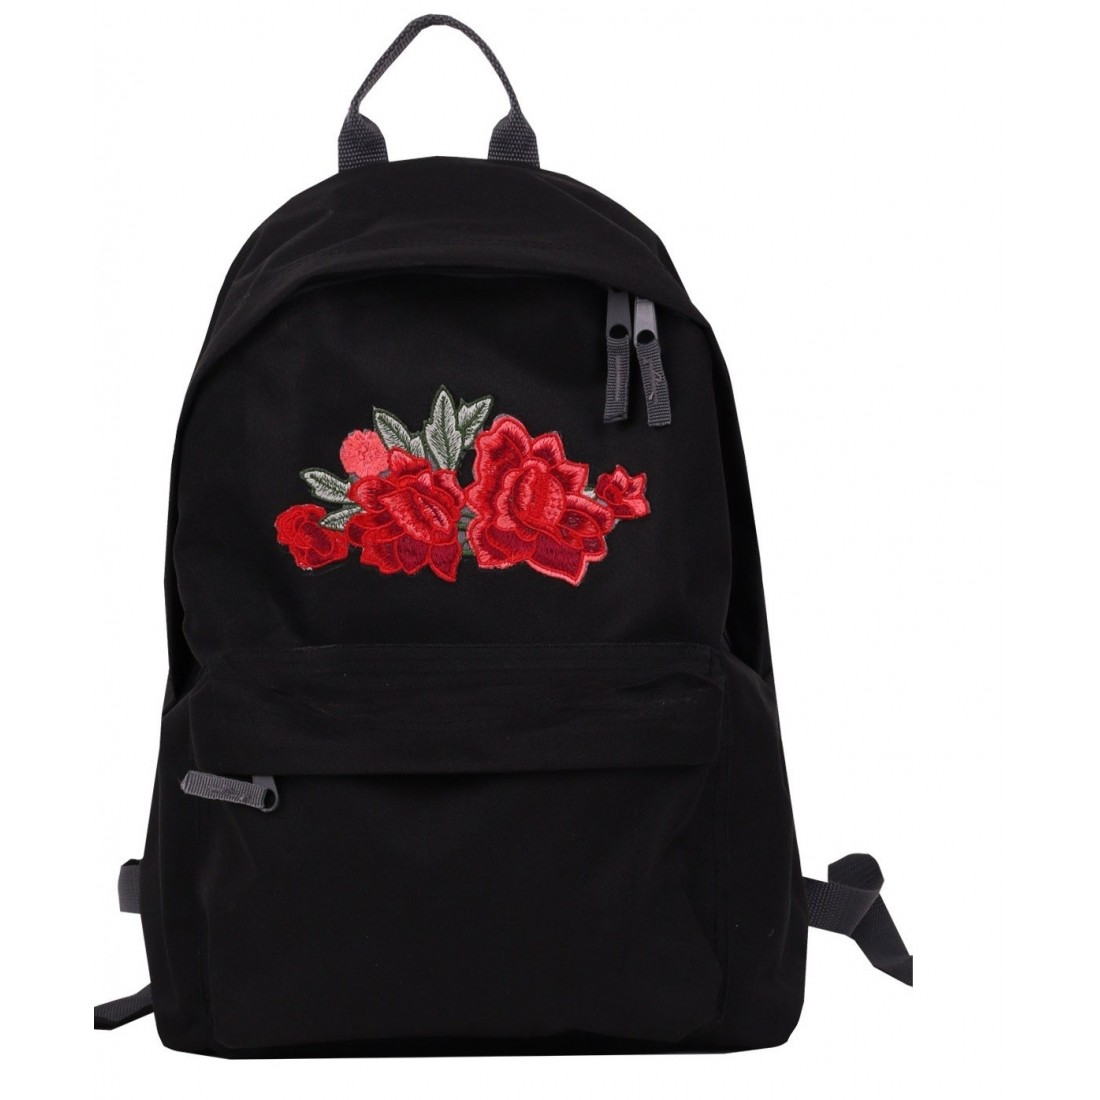 Plecak Simple Roses z różą Black/Czarny